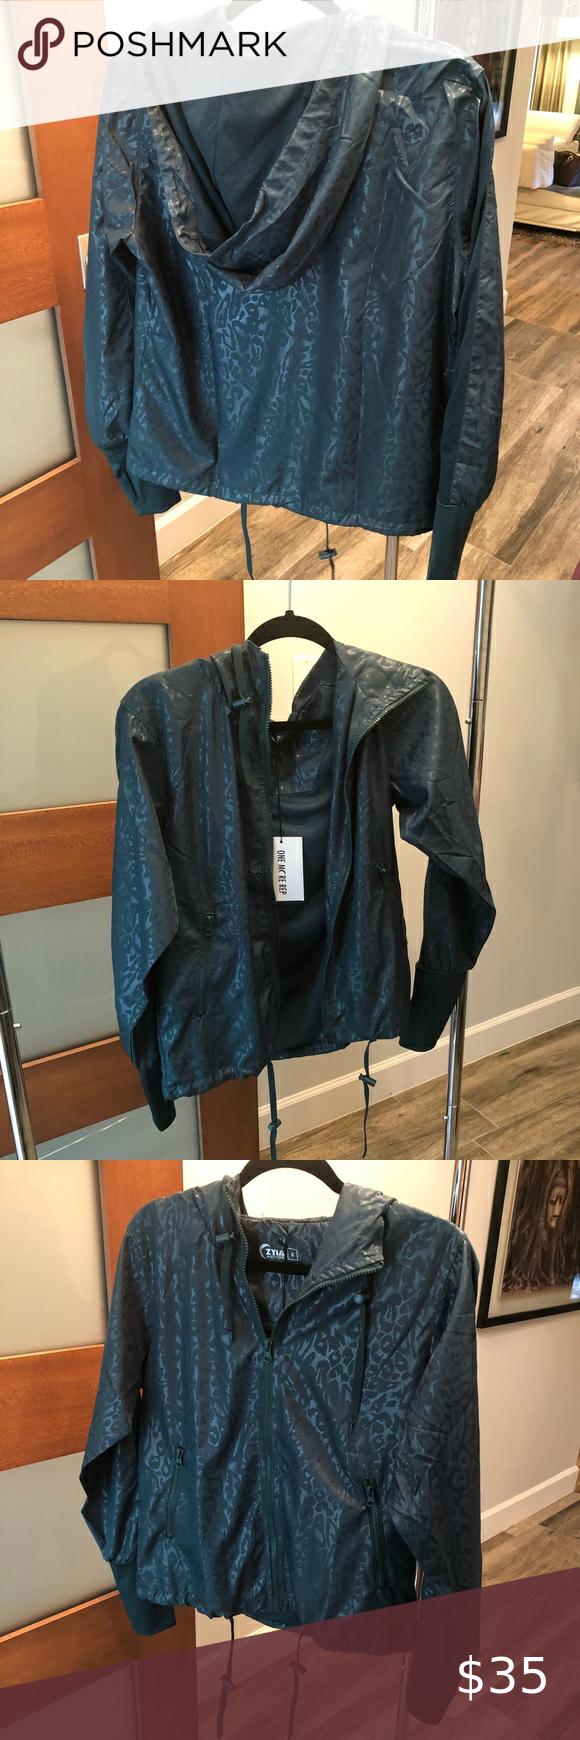 Zyia Active New Jade Bomber Jacket S Bomber Jacket Jackets Jackets For Women [ 1740 x 580 Pixel ]